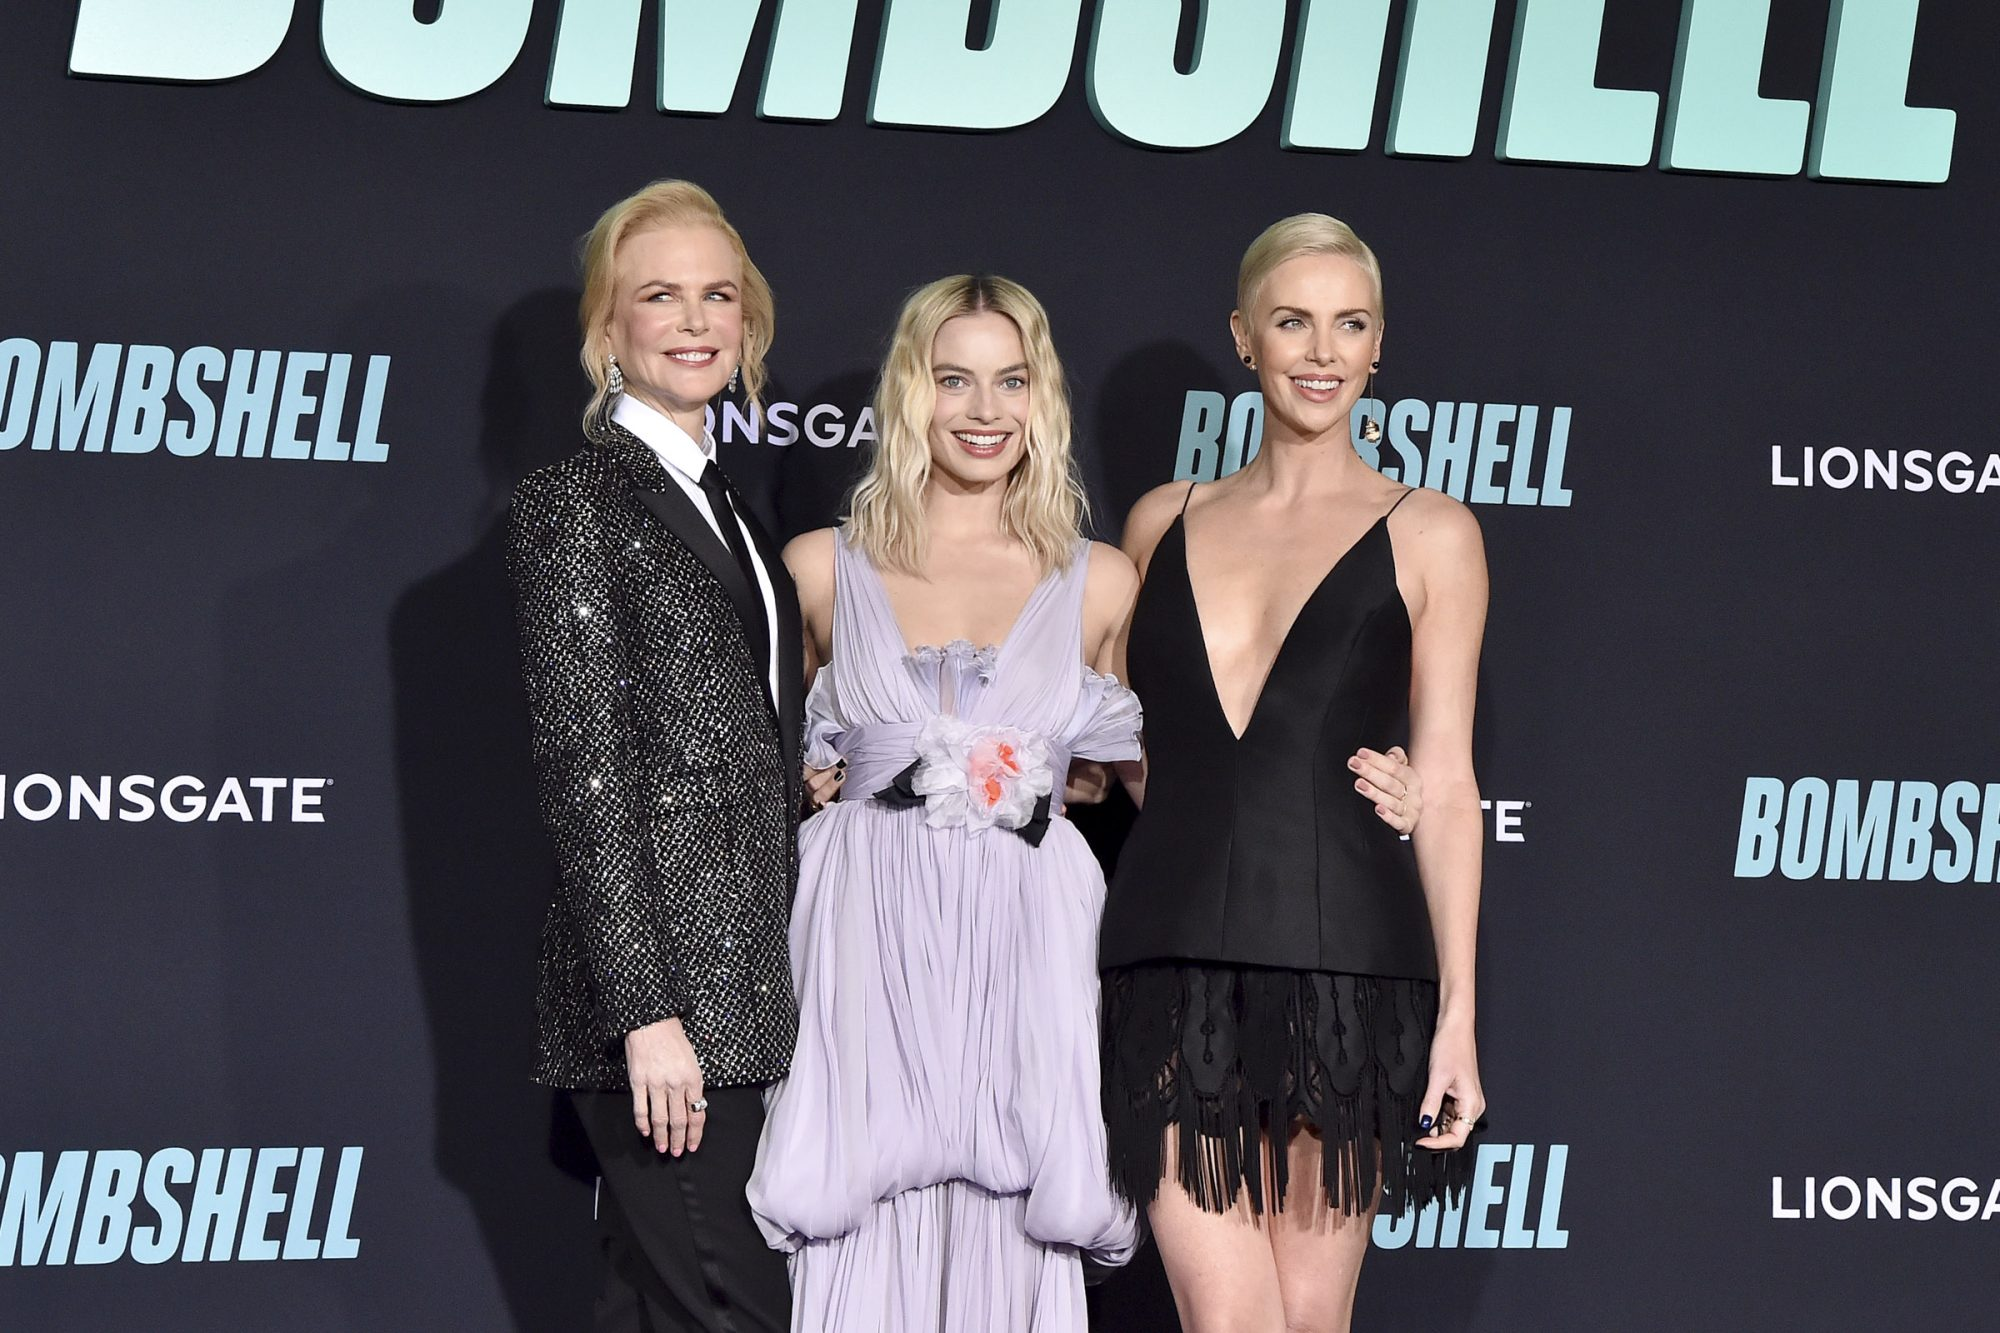 Nicole Kidman, Margot Robbie, and Charlize Theron